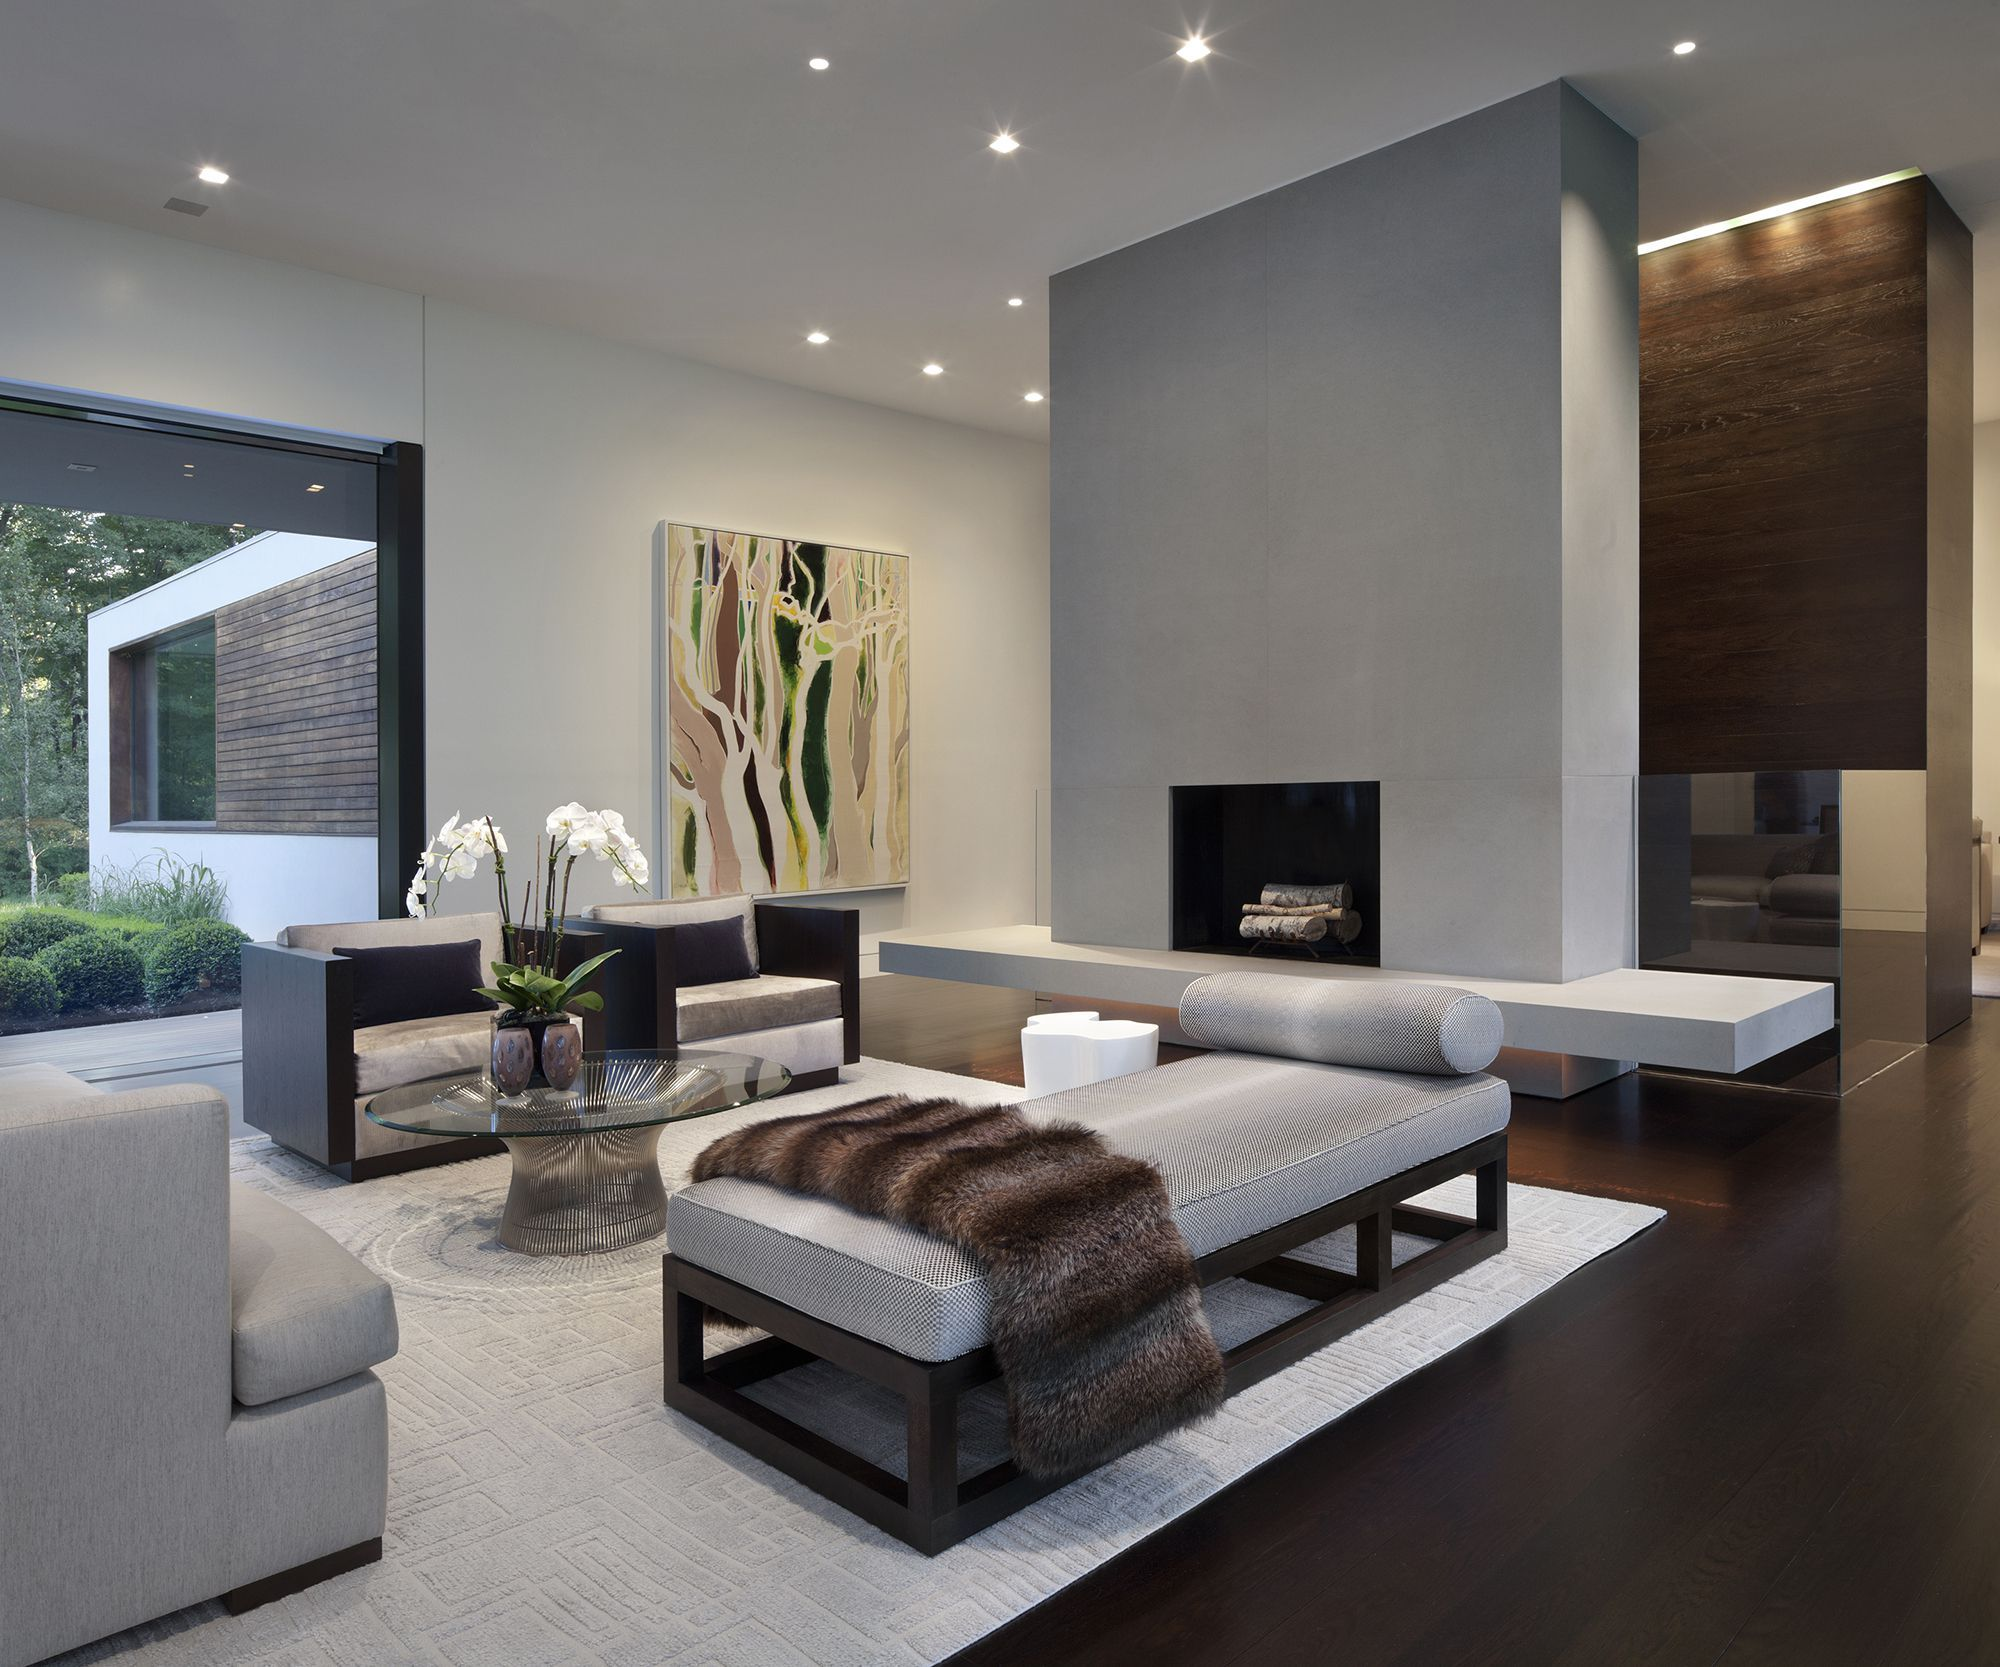 Modern House Interior Living Room Google Search Modern Houses Interior House Paint Interior Modern House Design Modern home design ideas for living room